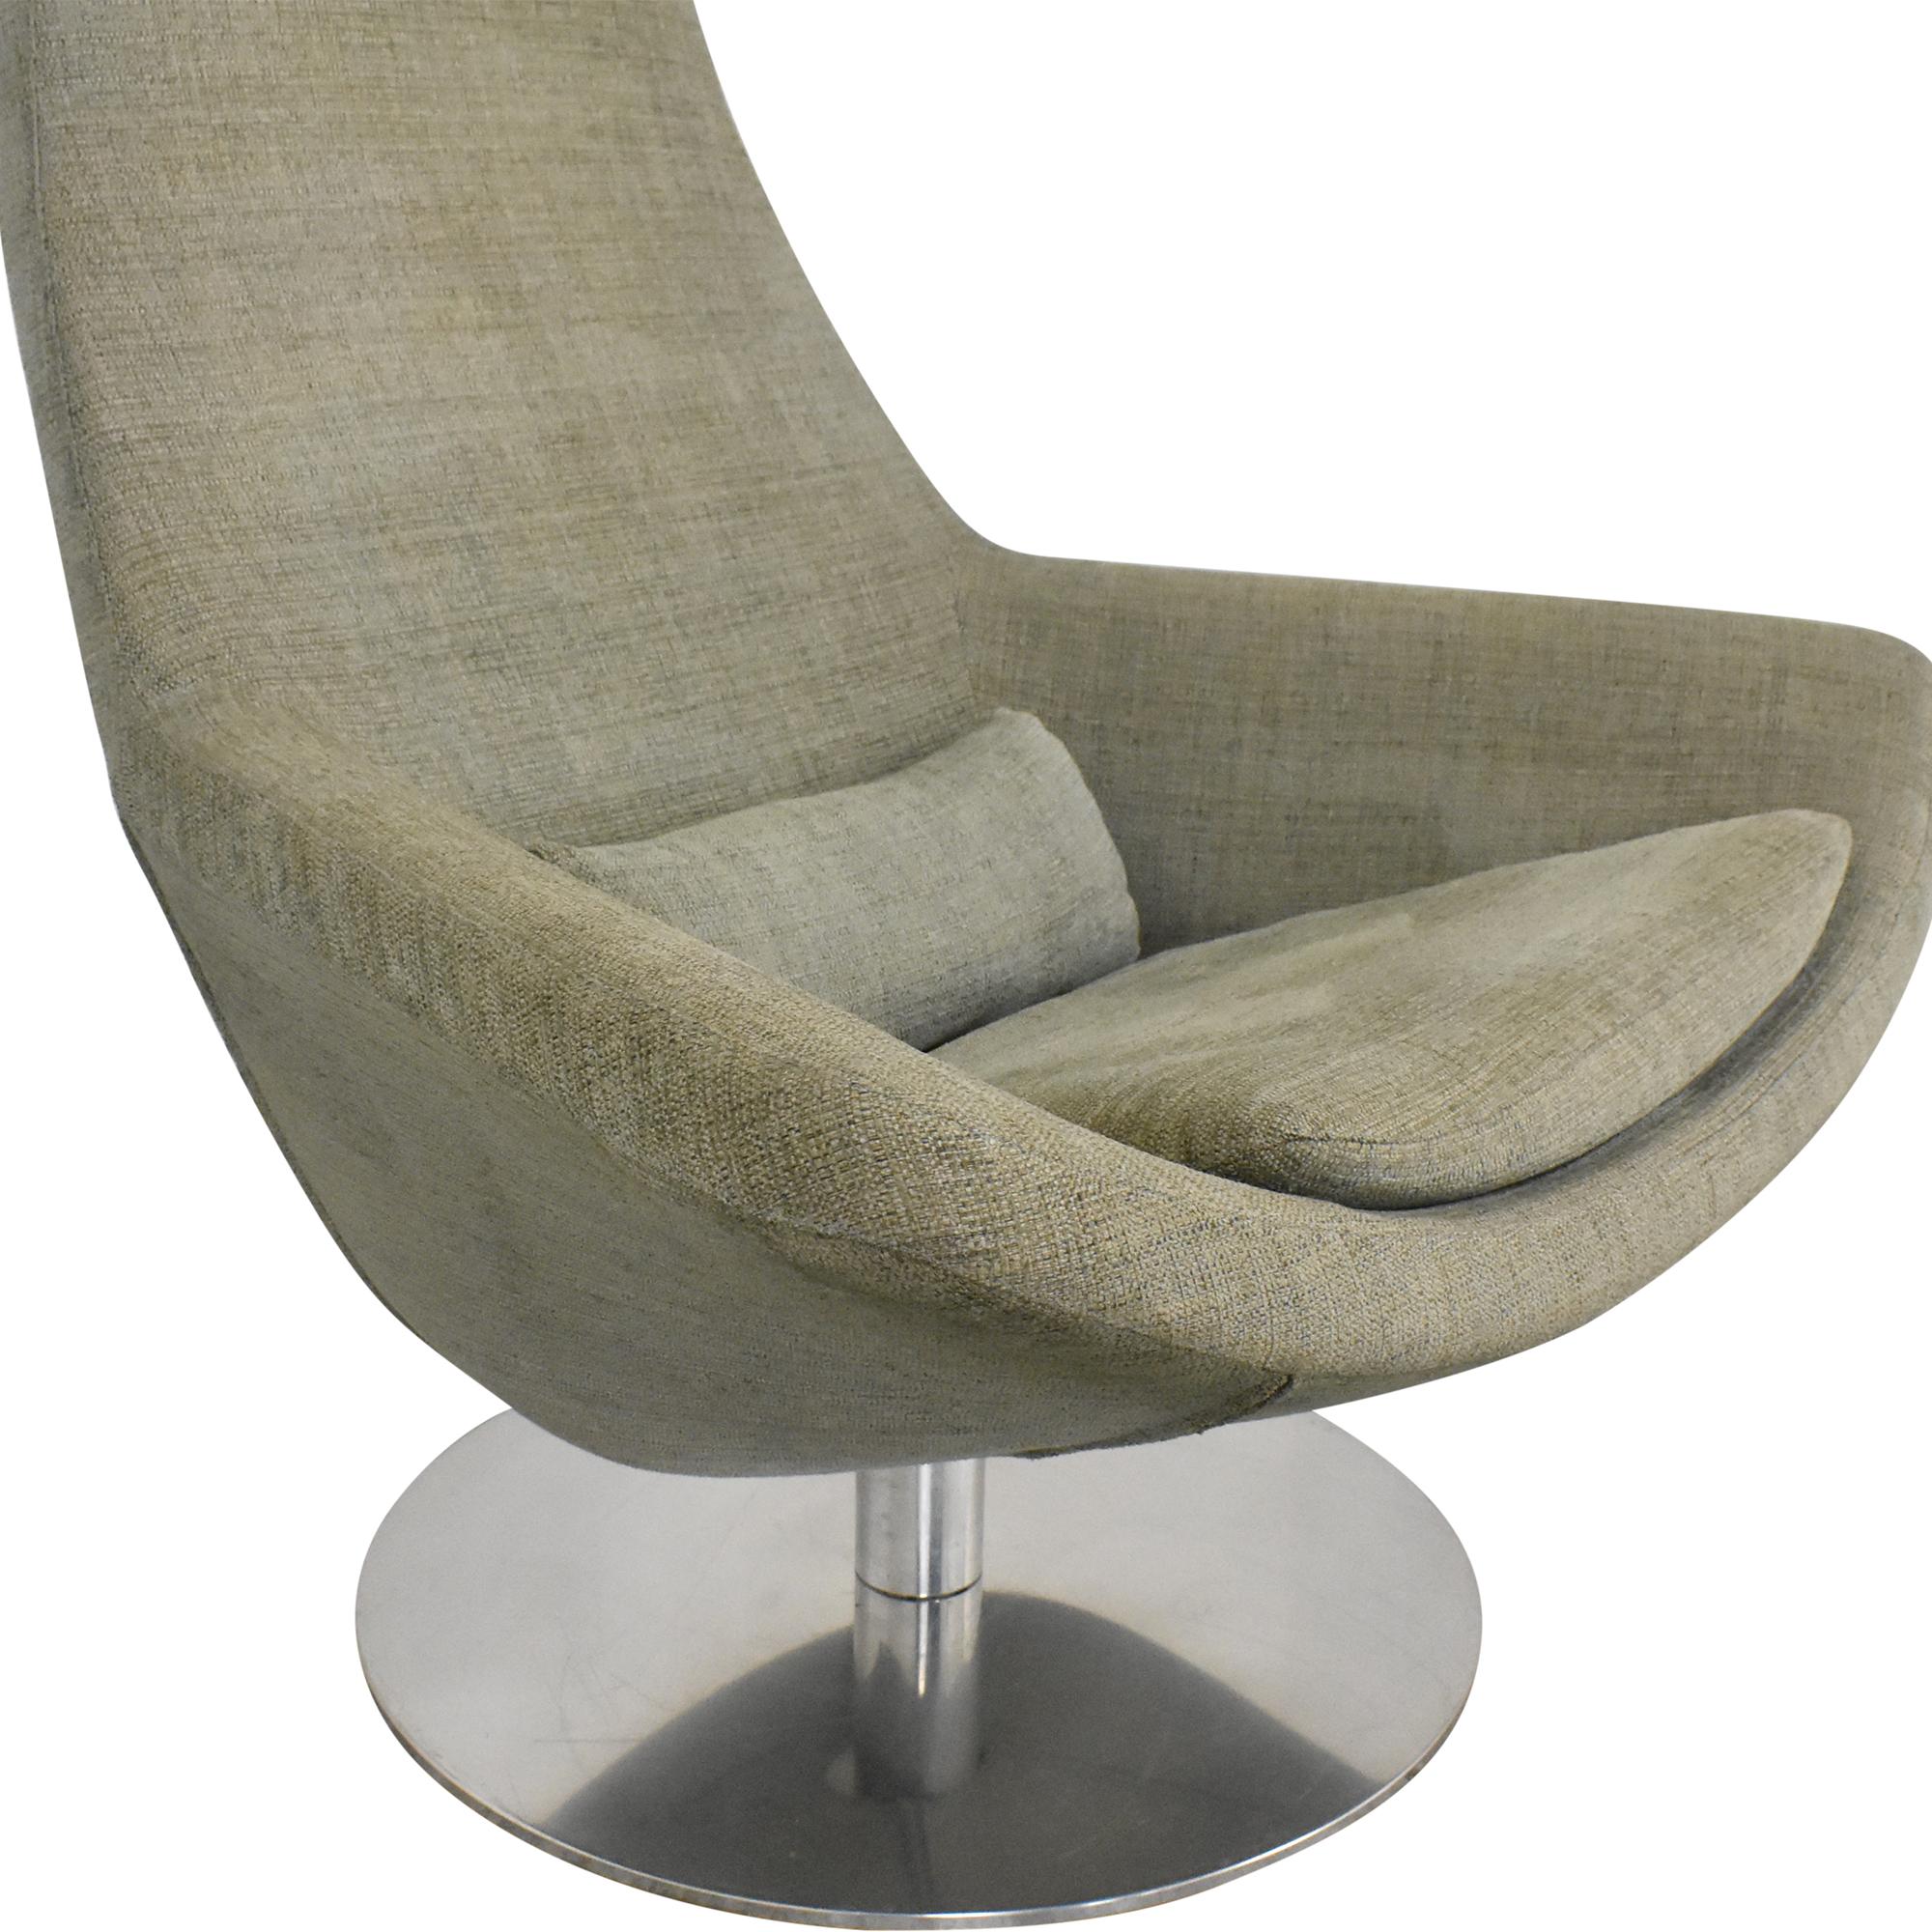 B&B Italia B&B Italia Metropolitan Swivel Chair price